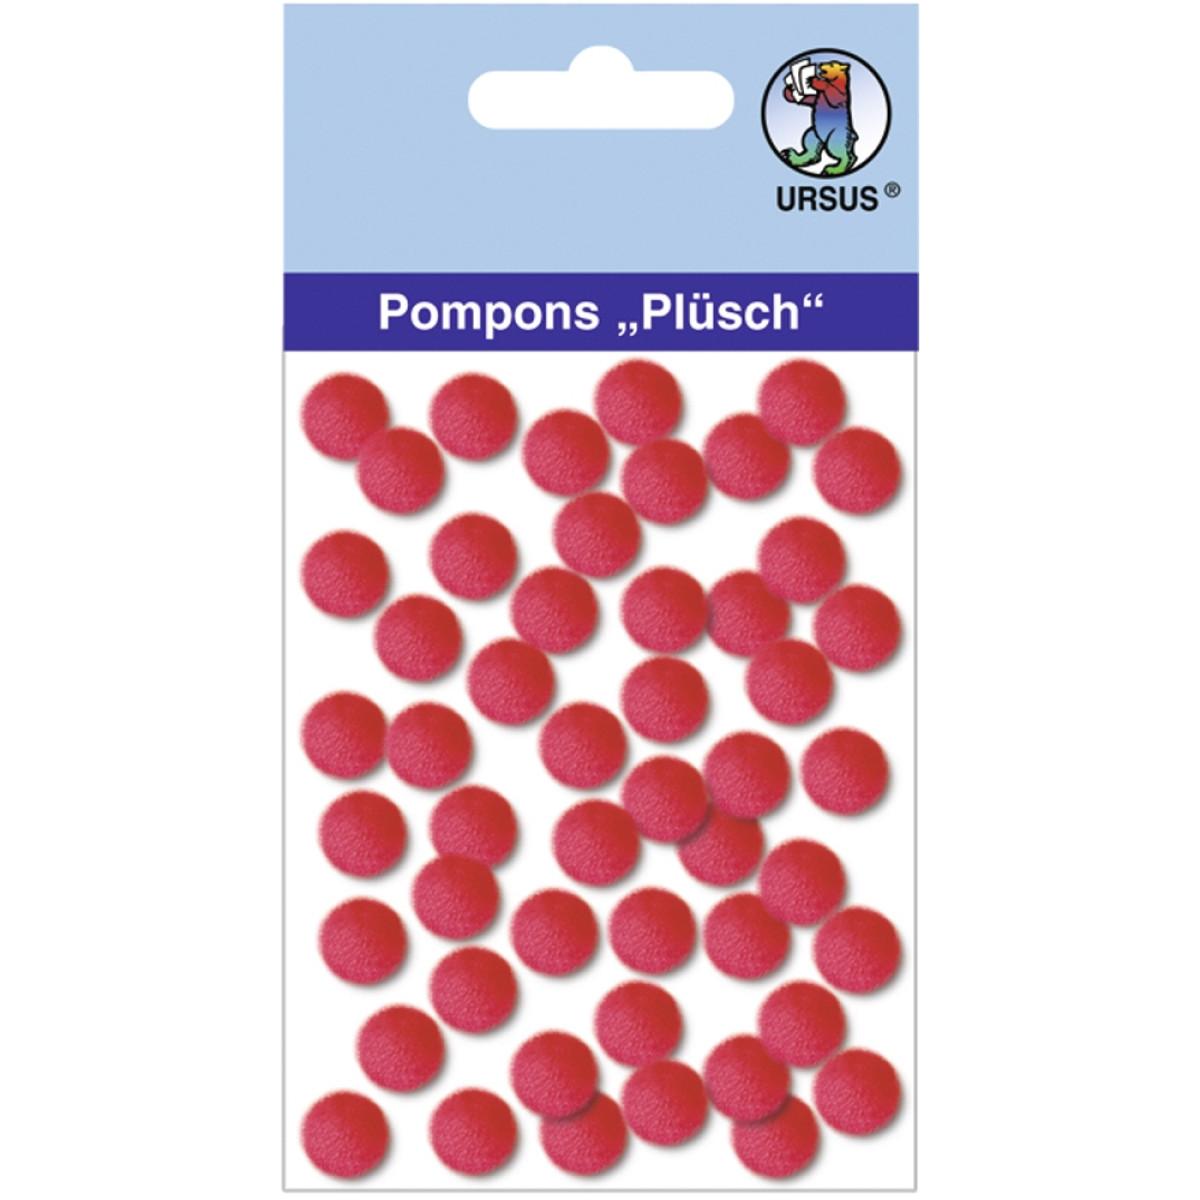 "Pompons ""Plüsch"" 10 mm rubinrot"